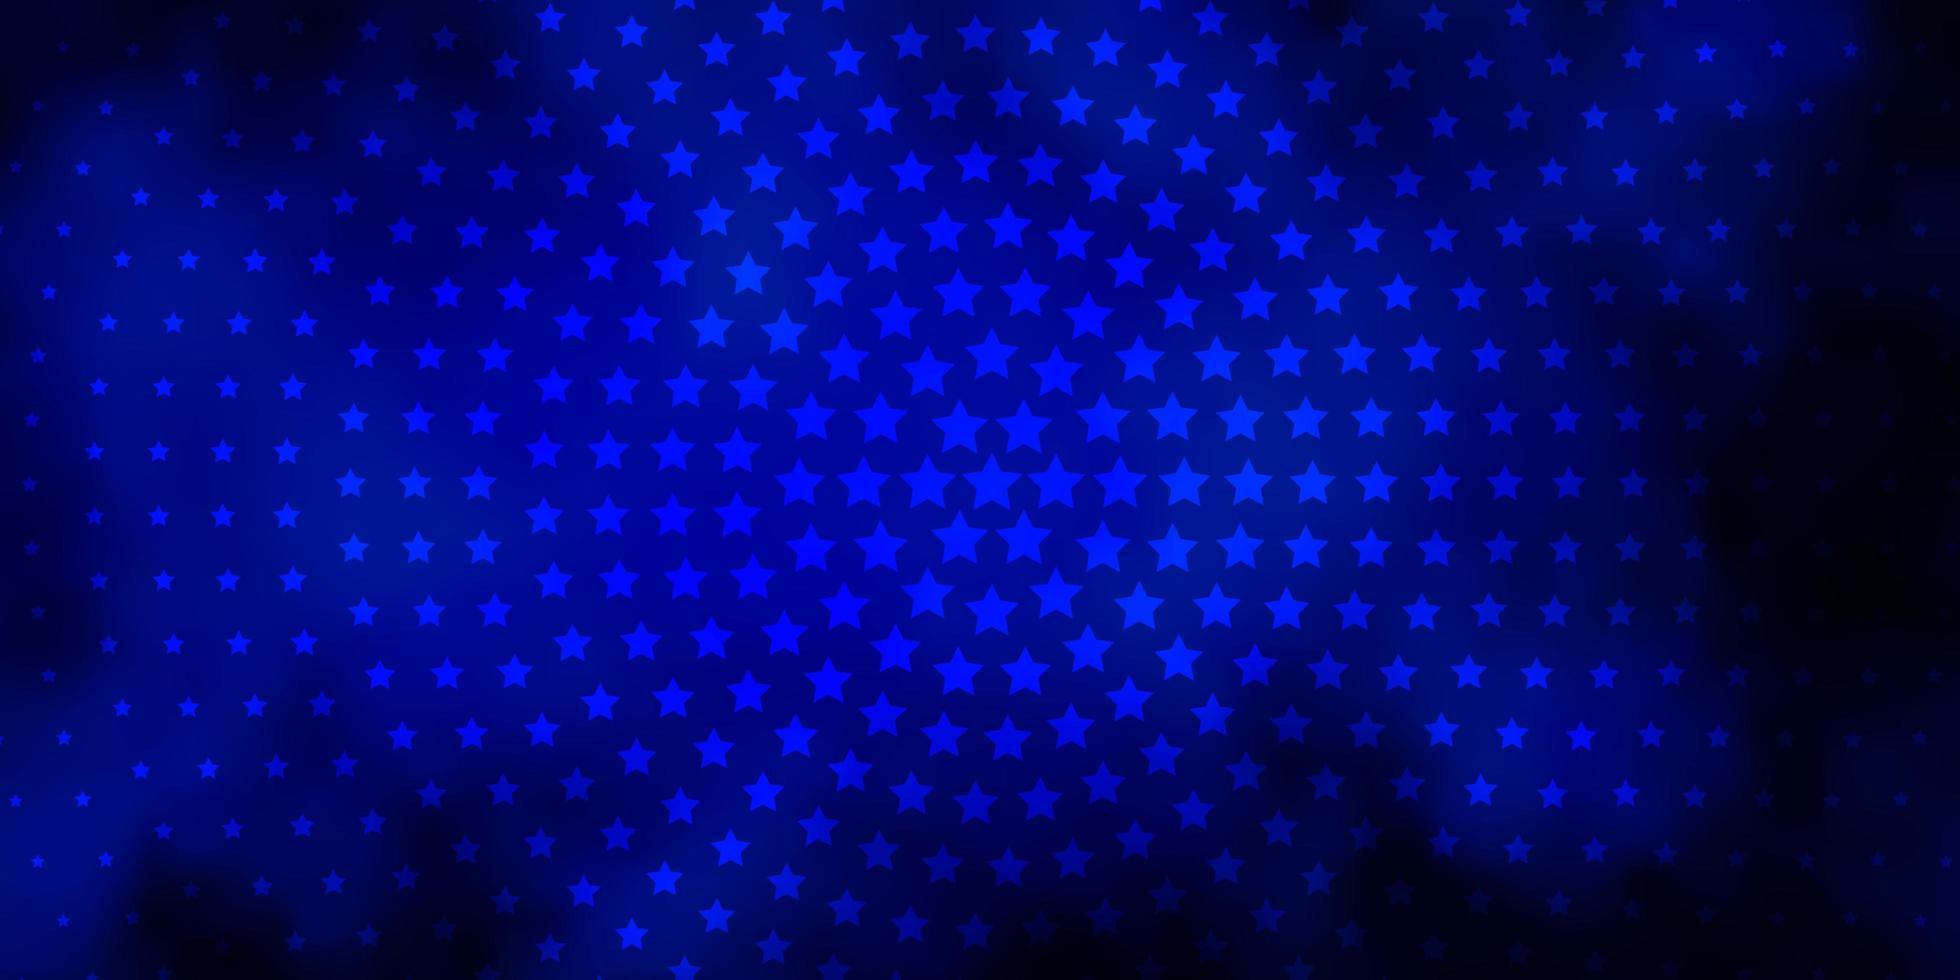 layout de vetor de azul escuro com estrelas brilhantes.